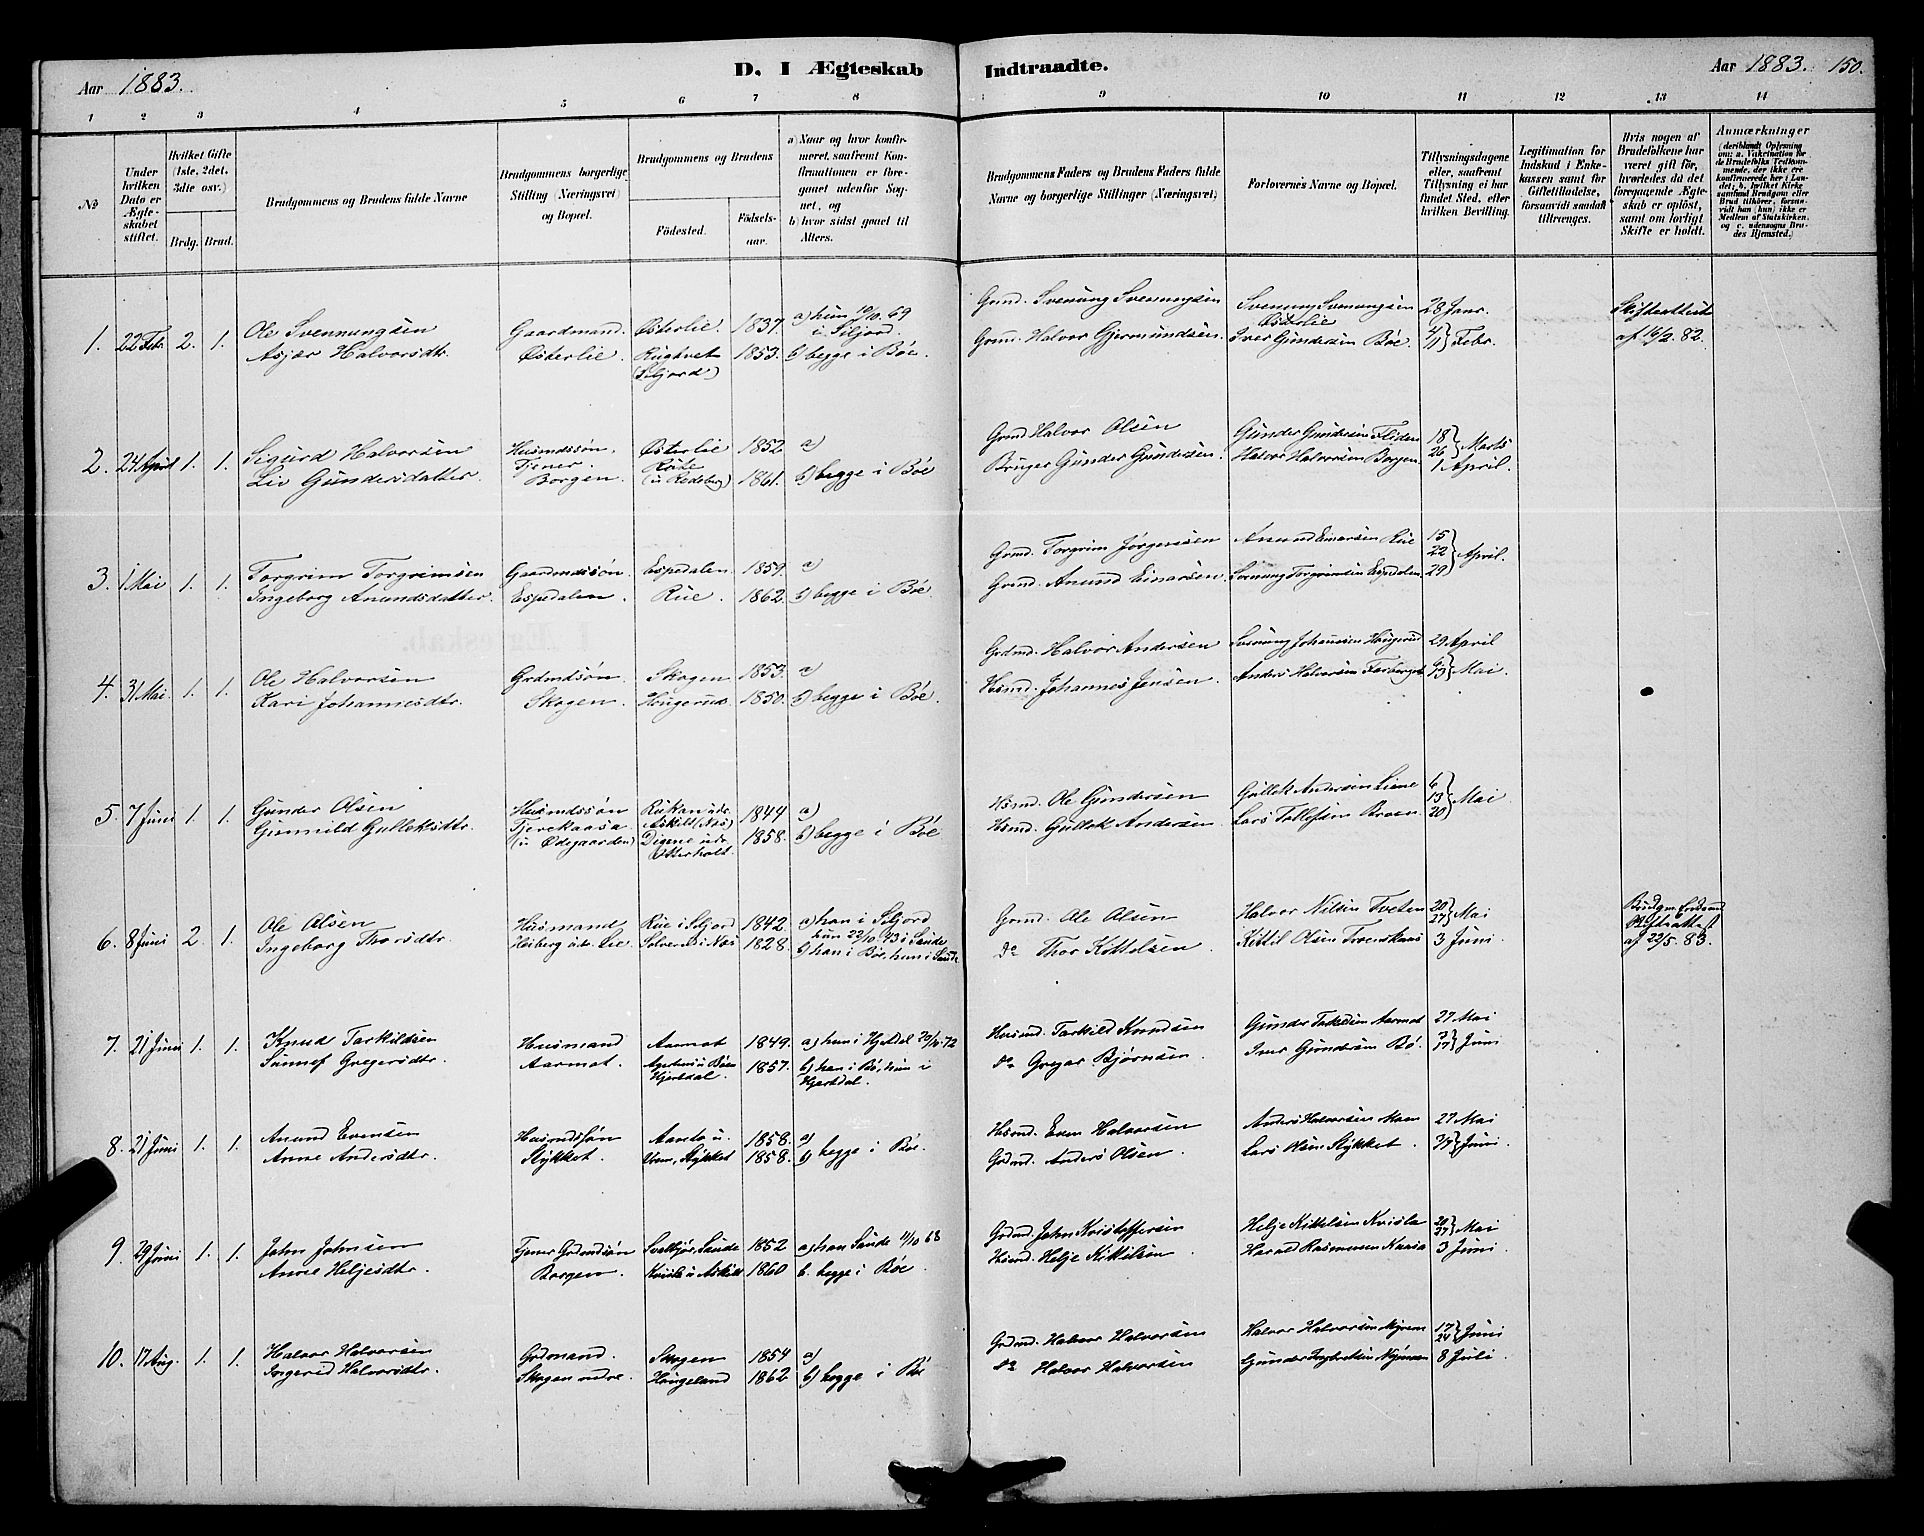 SAKO, Bø kirkebøker, G/Ga/L0005: Klokkerbok nr. 5, 1883-1897, s. 150